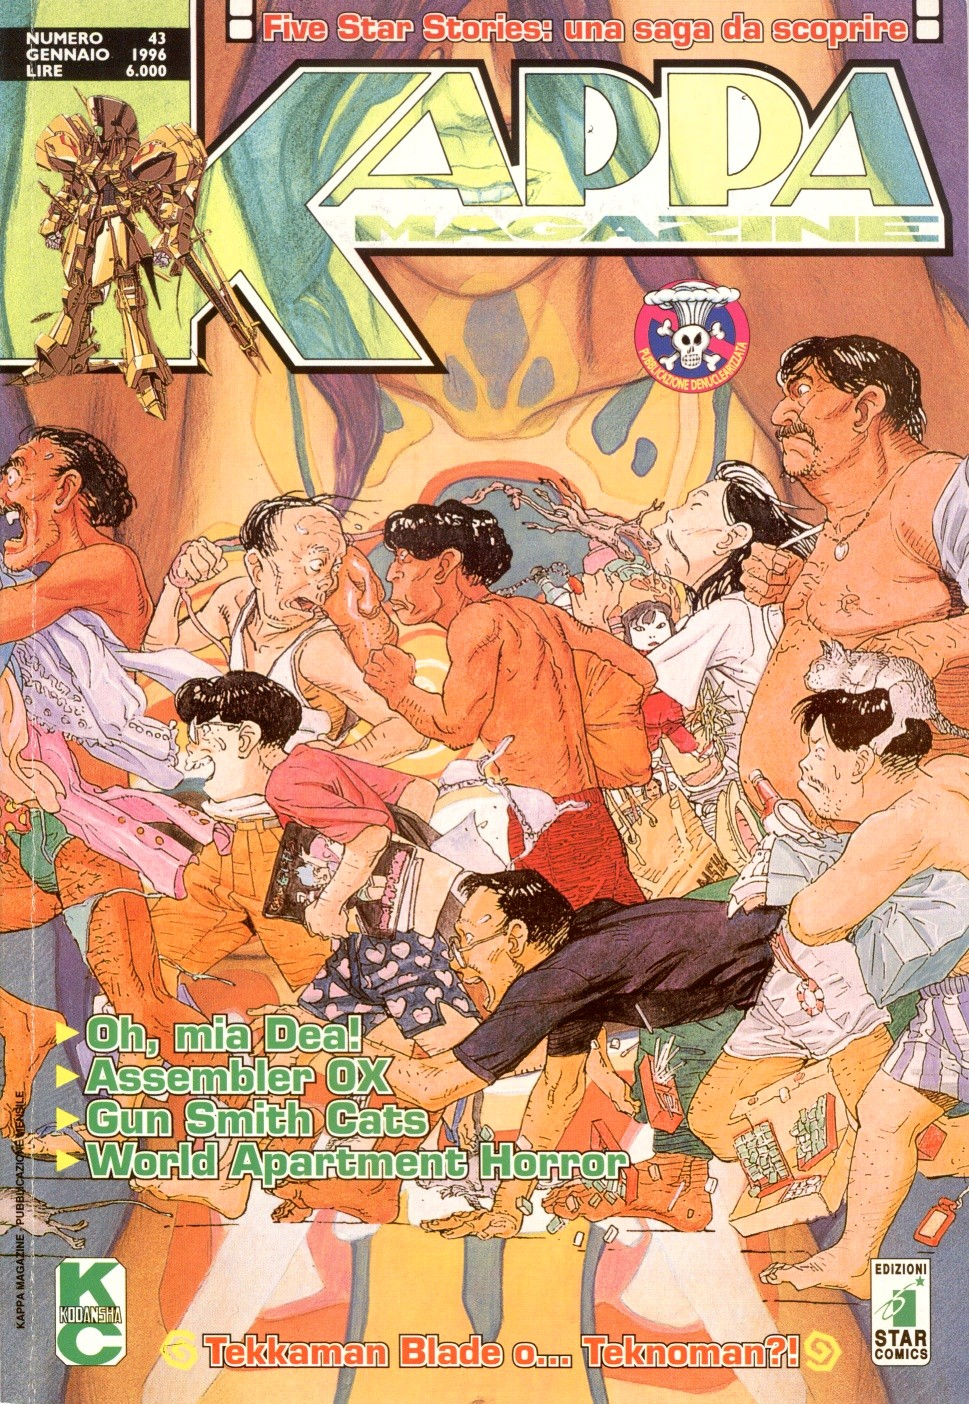 Kappa Magazine Vol 1 43